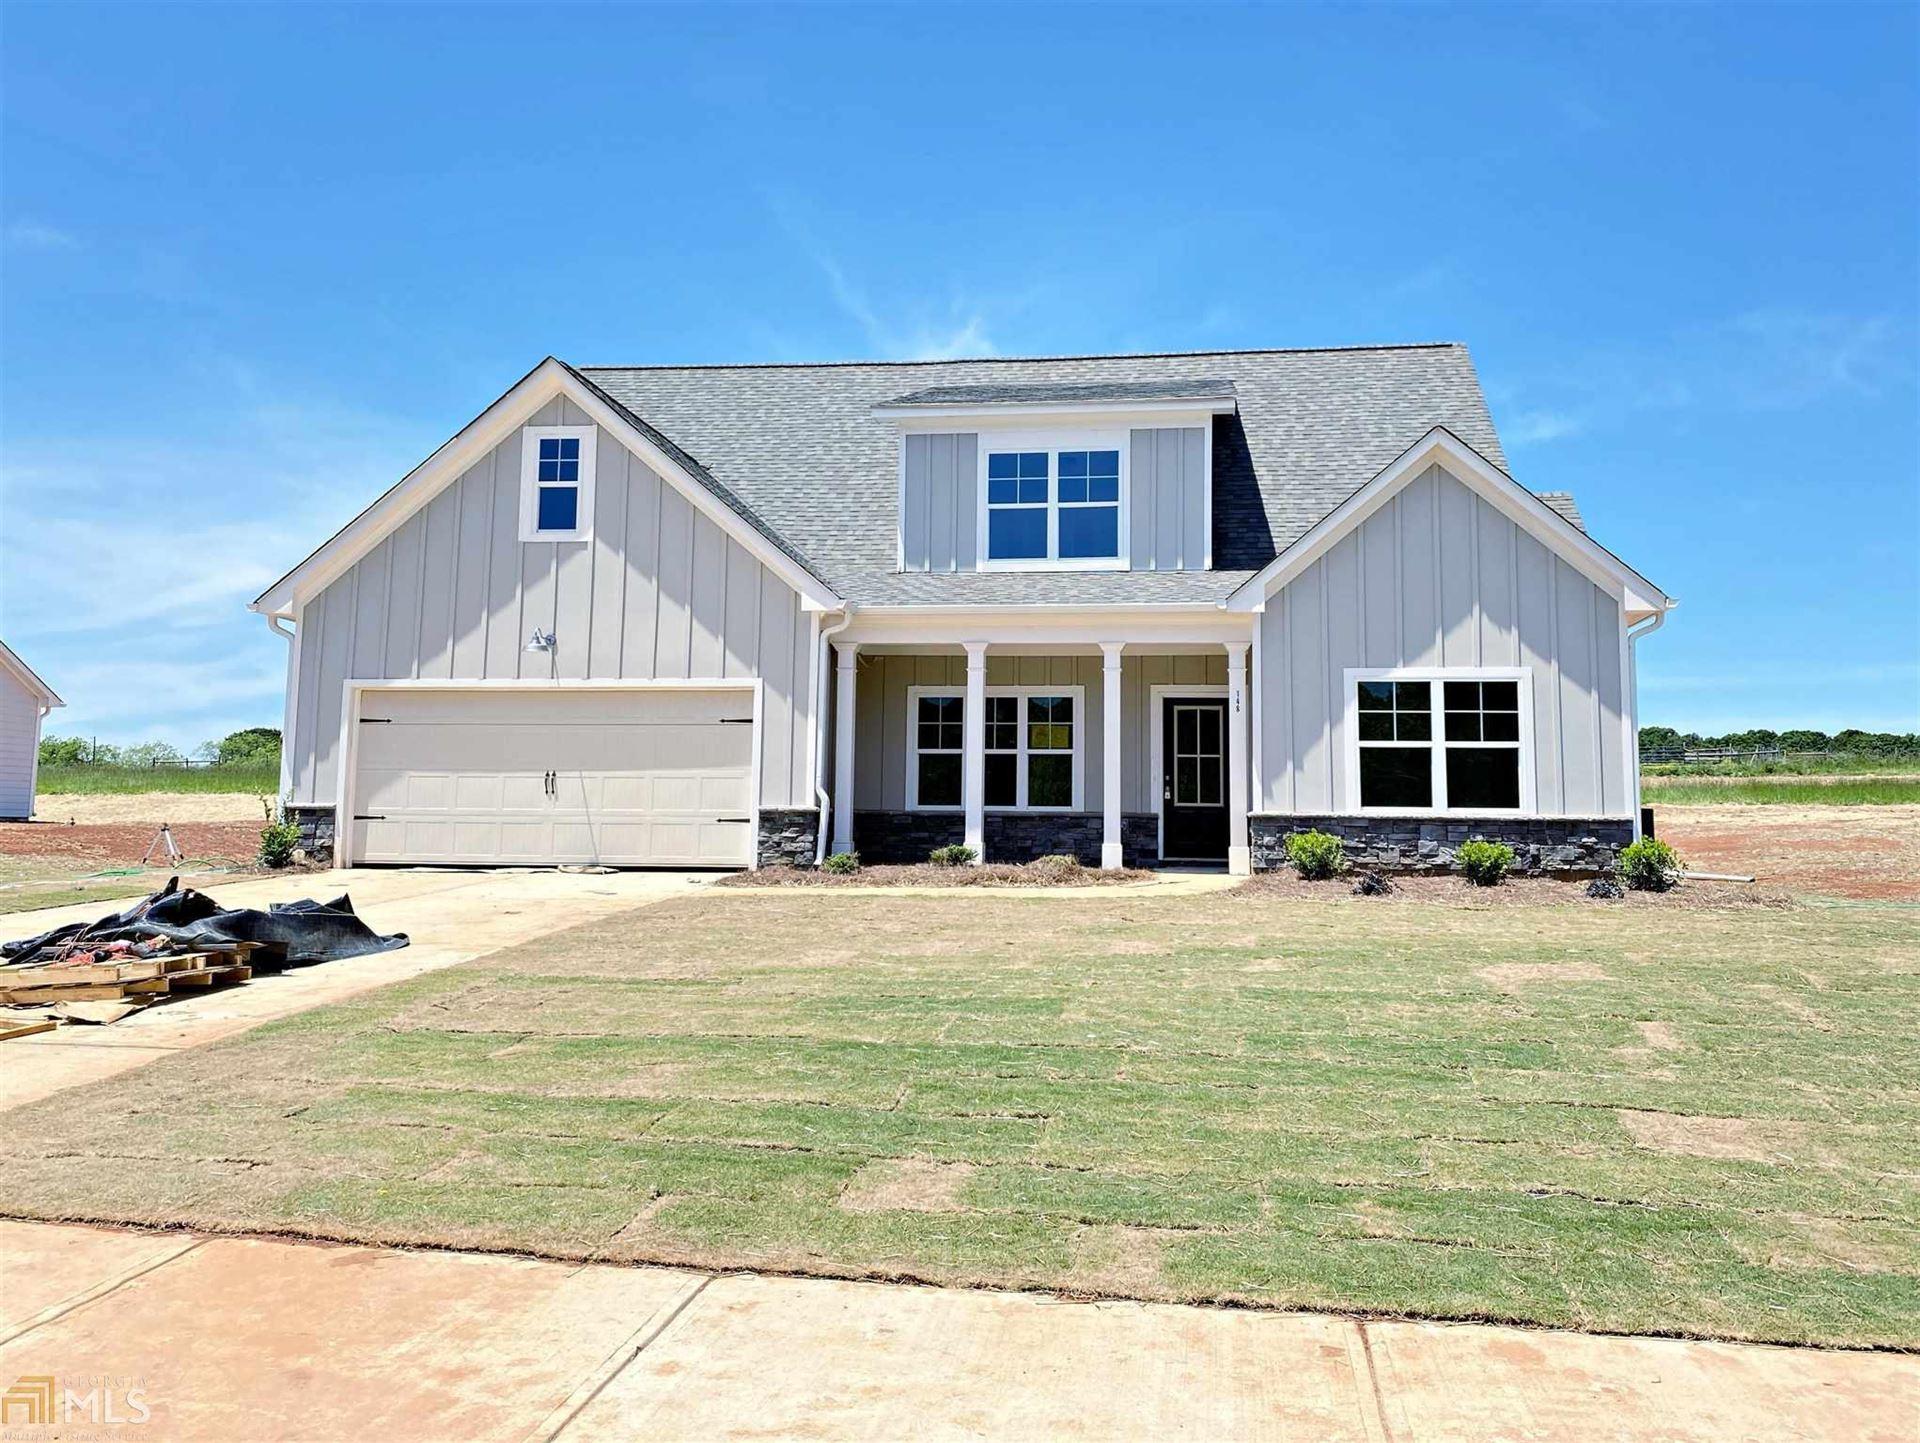 26 Farm Lakeside Dr, Winder, GA 30680 - #: 8812112